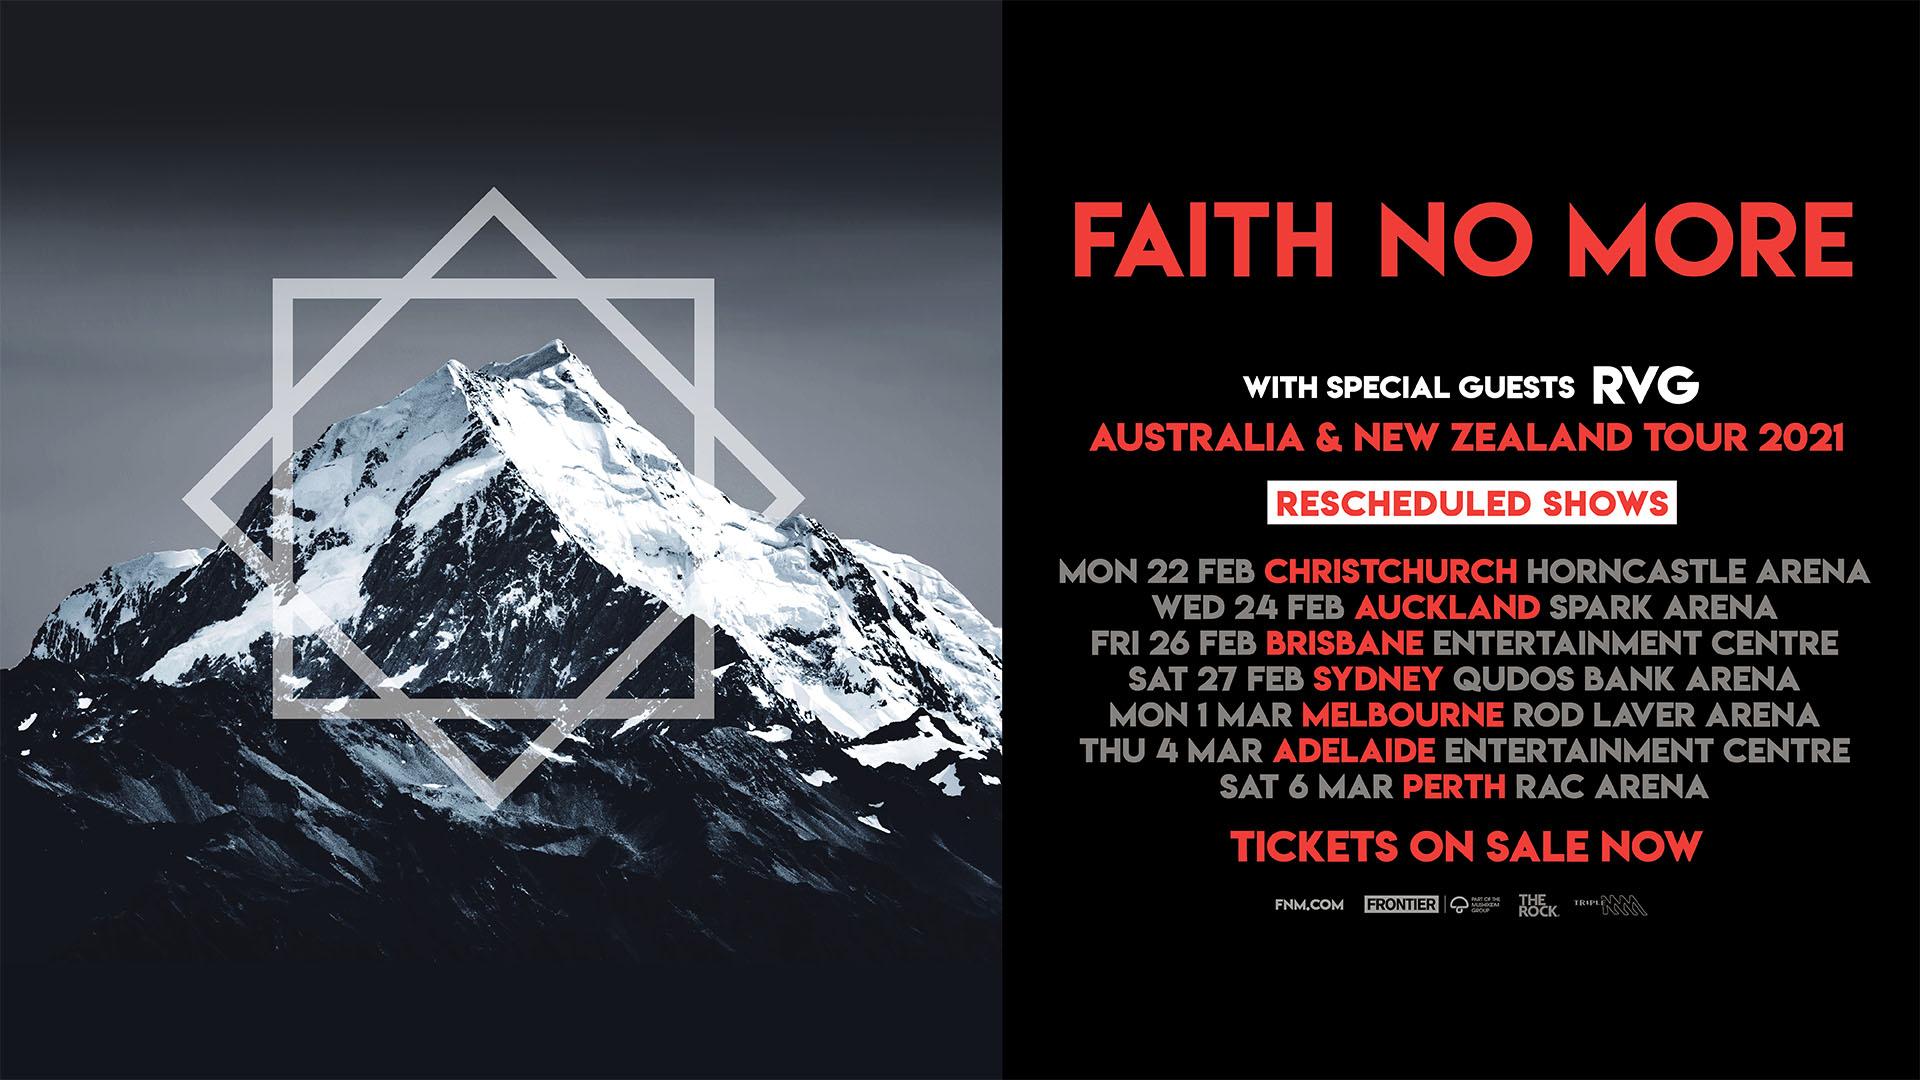 Faith No More rescheduled tour dates 2021